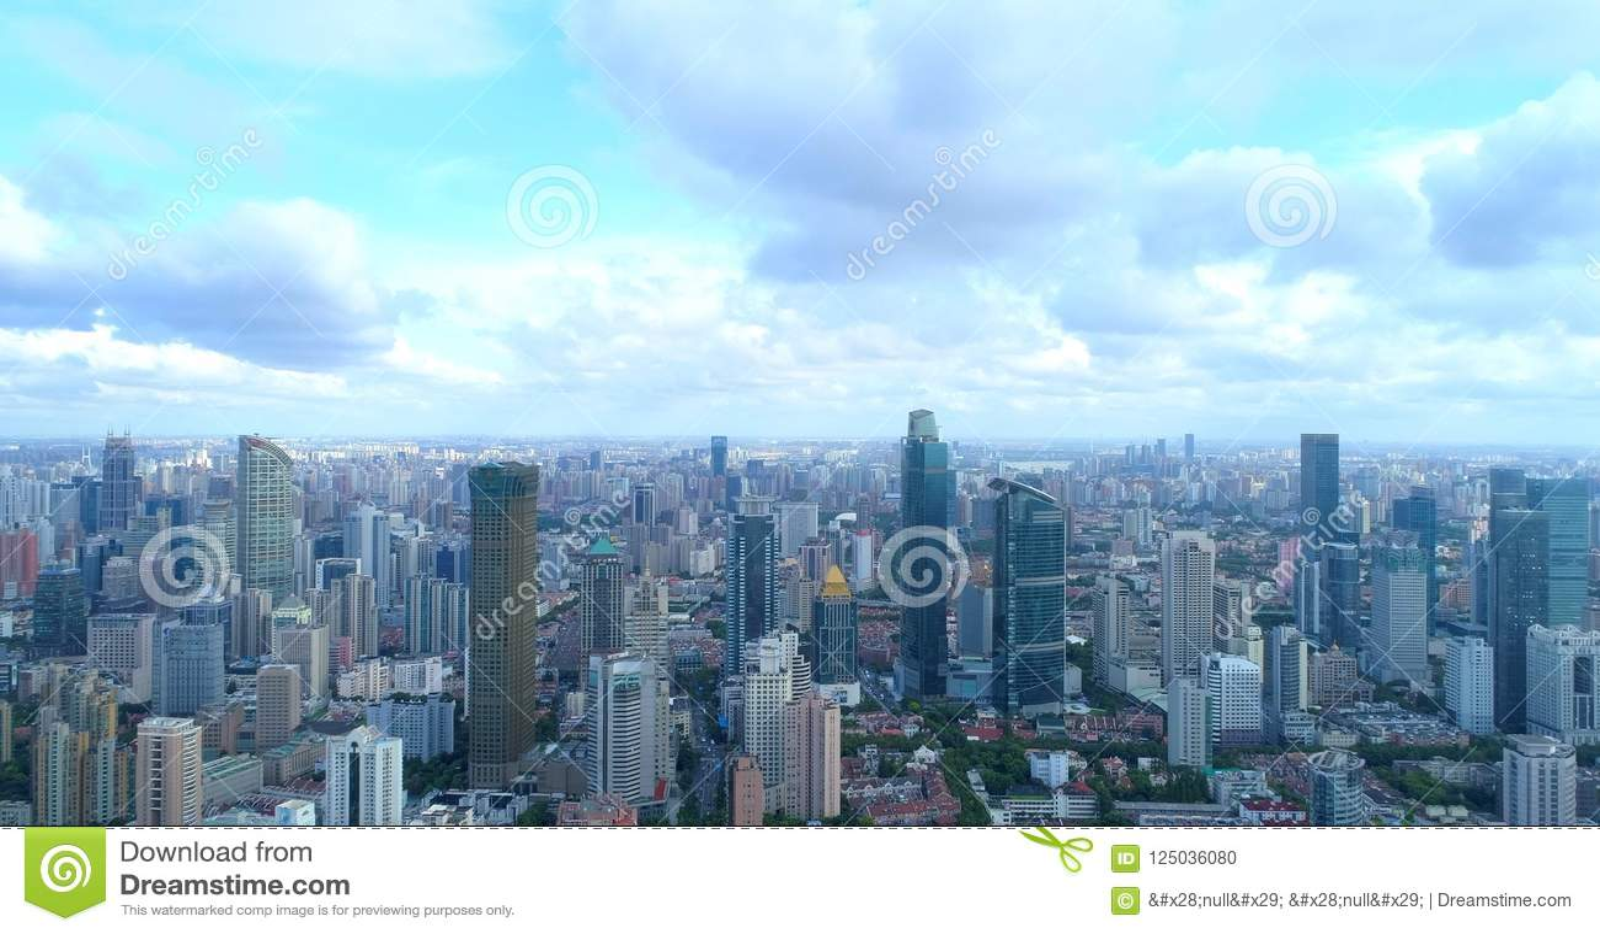 Aerial image of a megacity